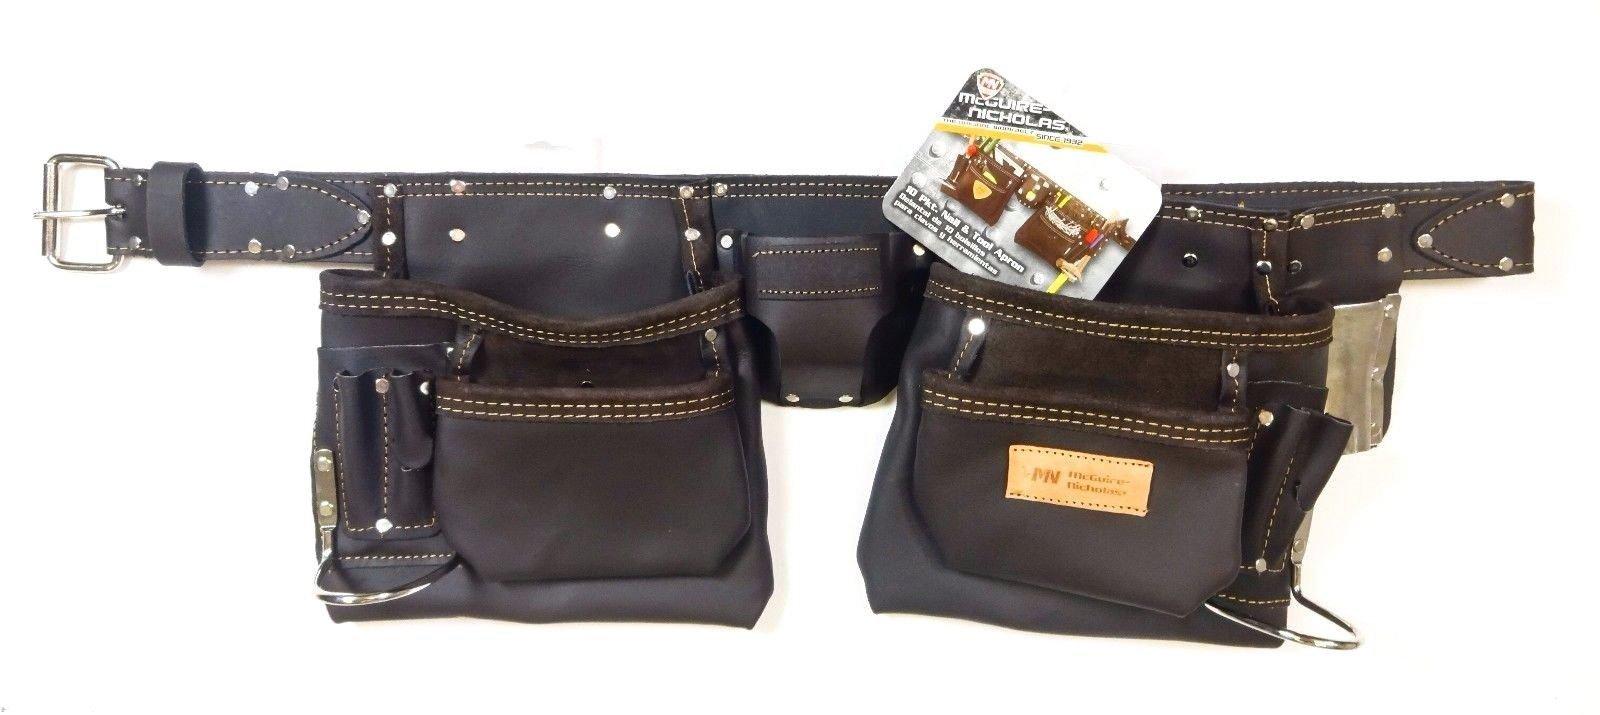 McGuire-Nicholas 10-Pocket Full Grain Leather Nail & Tool Apron Carpenter Belt